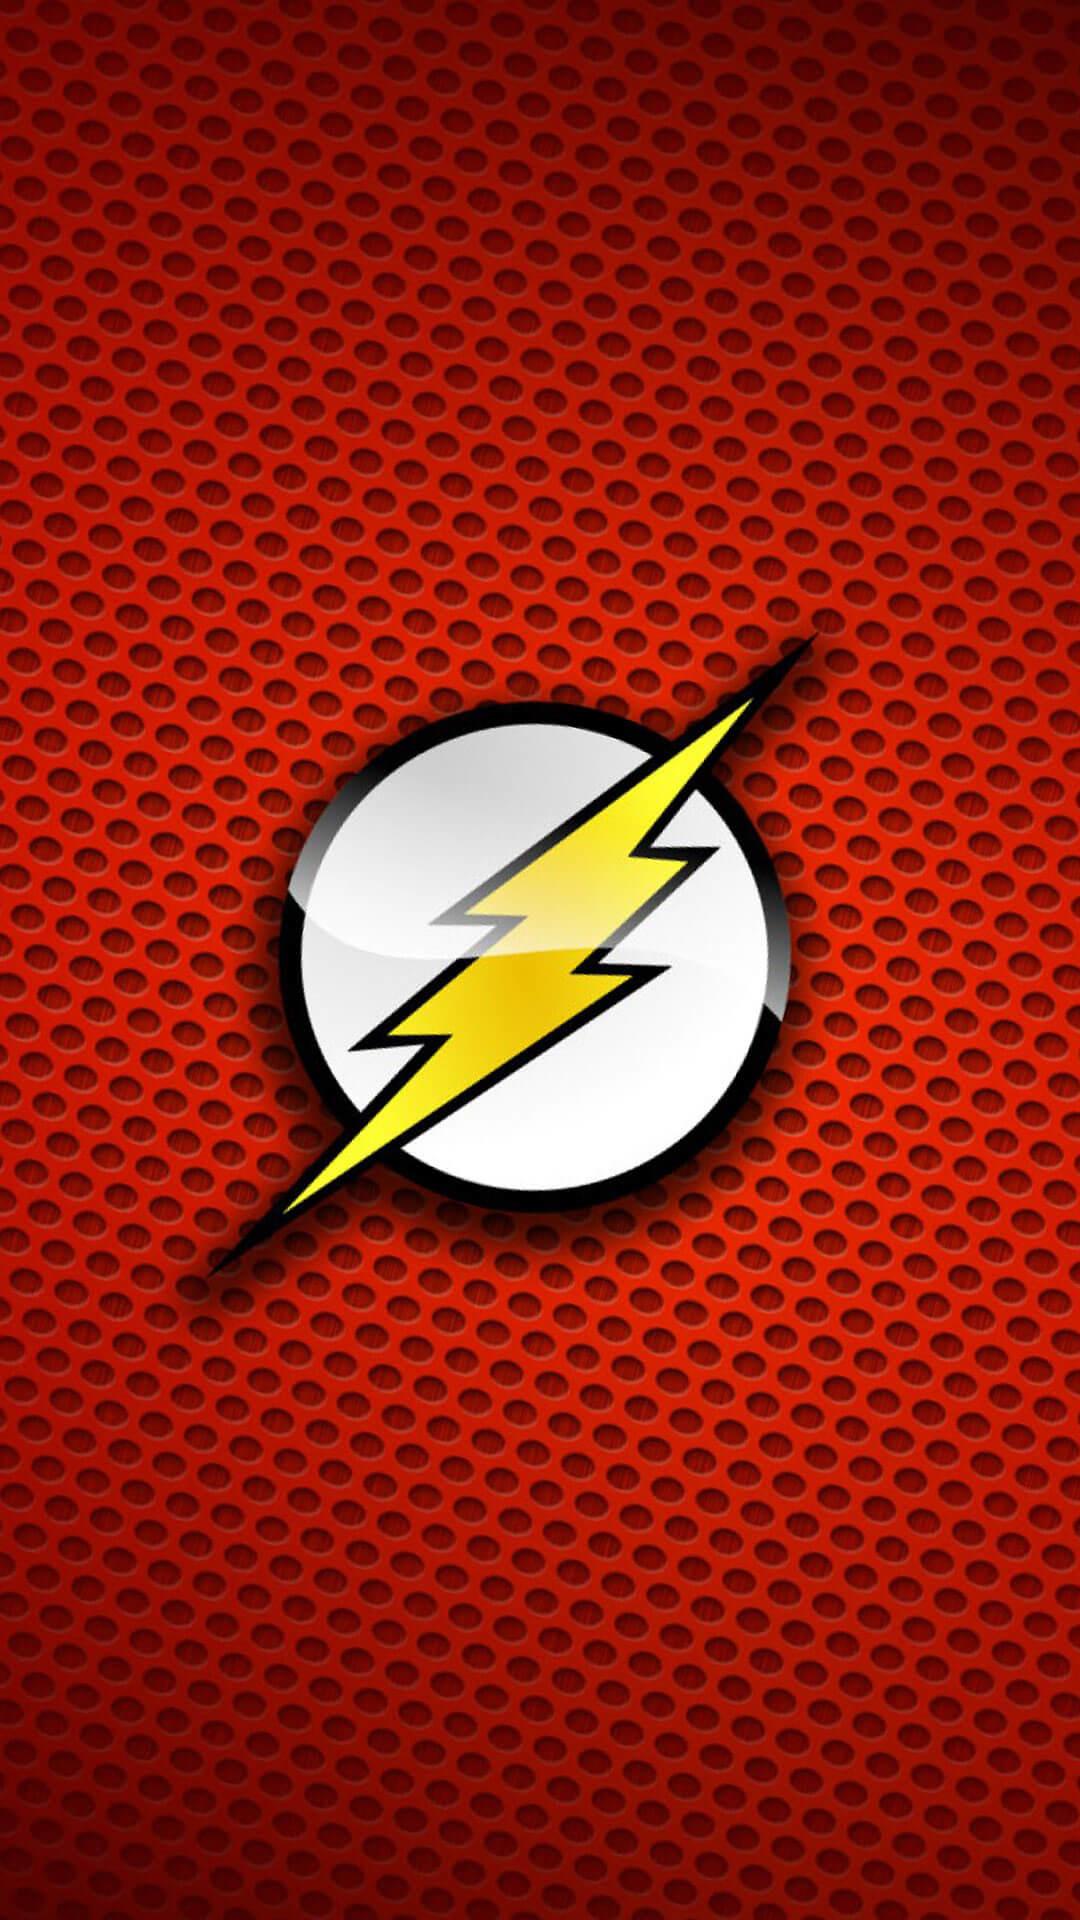 1080x1920 flash wallpaper iphone 6 the flash logo iphone 6 wallpaper